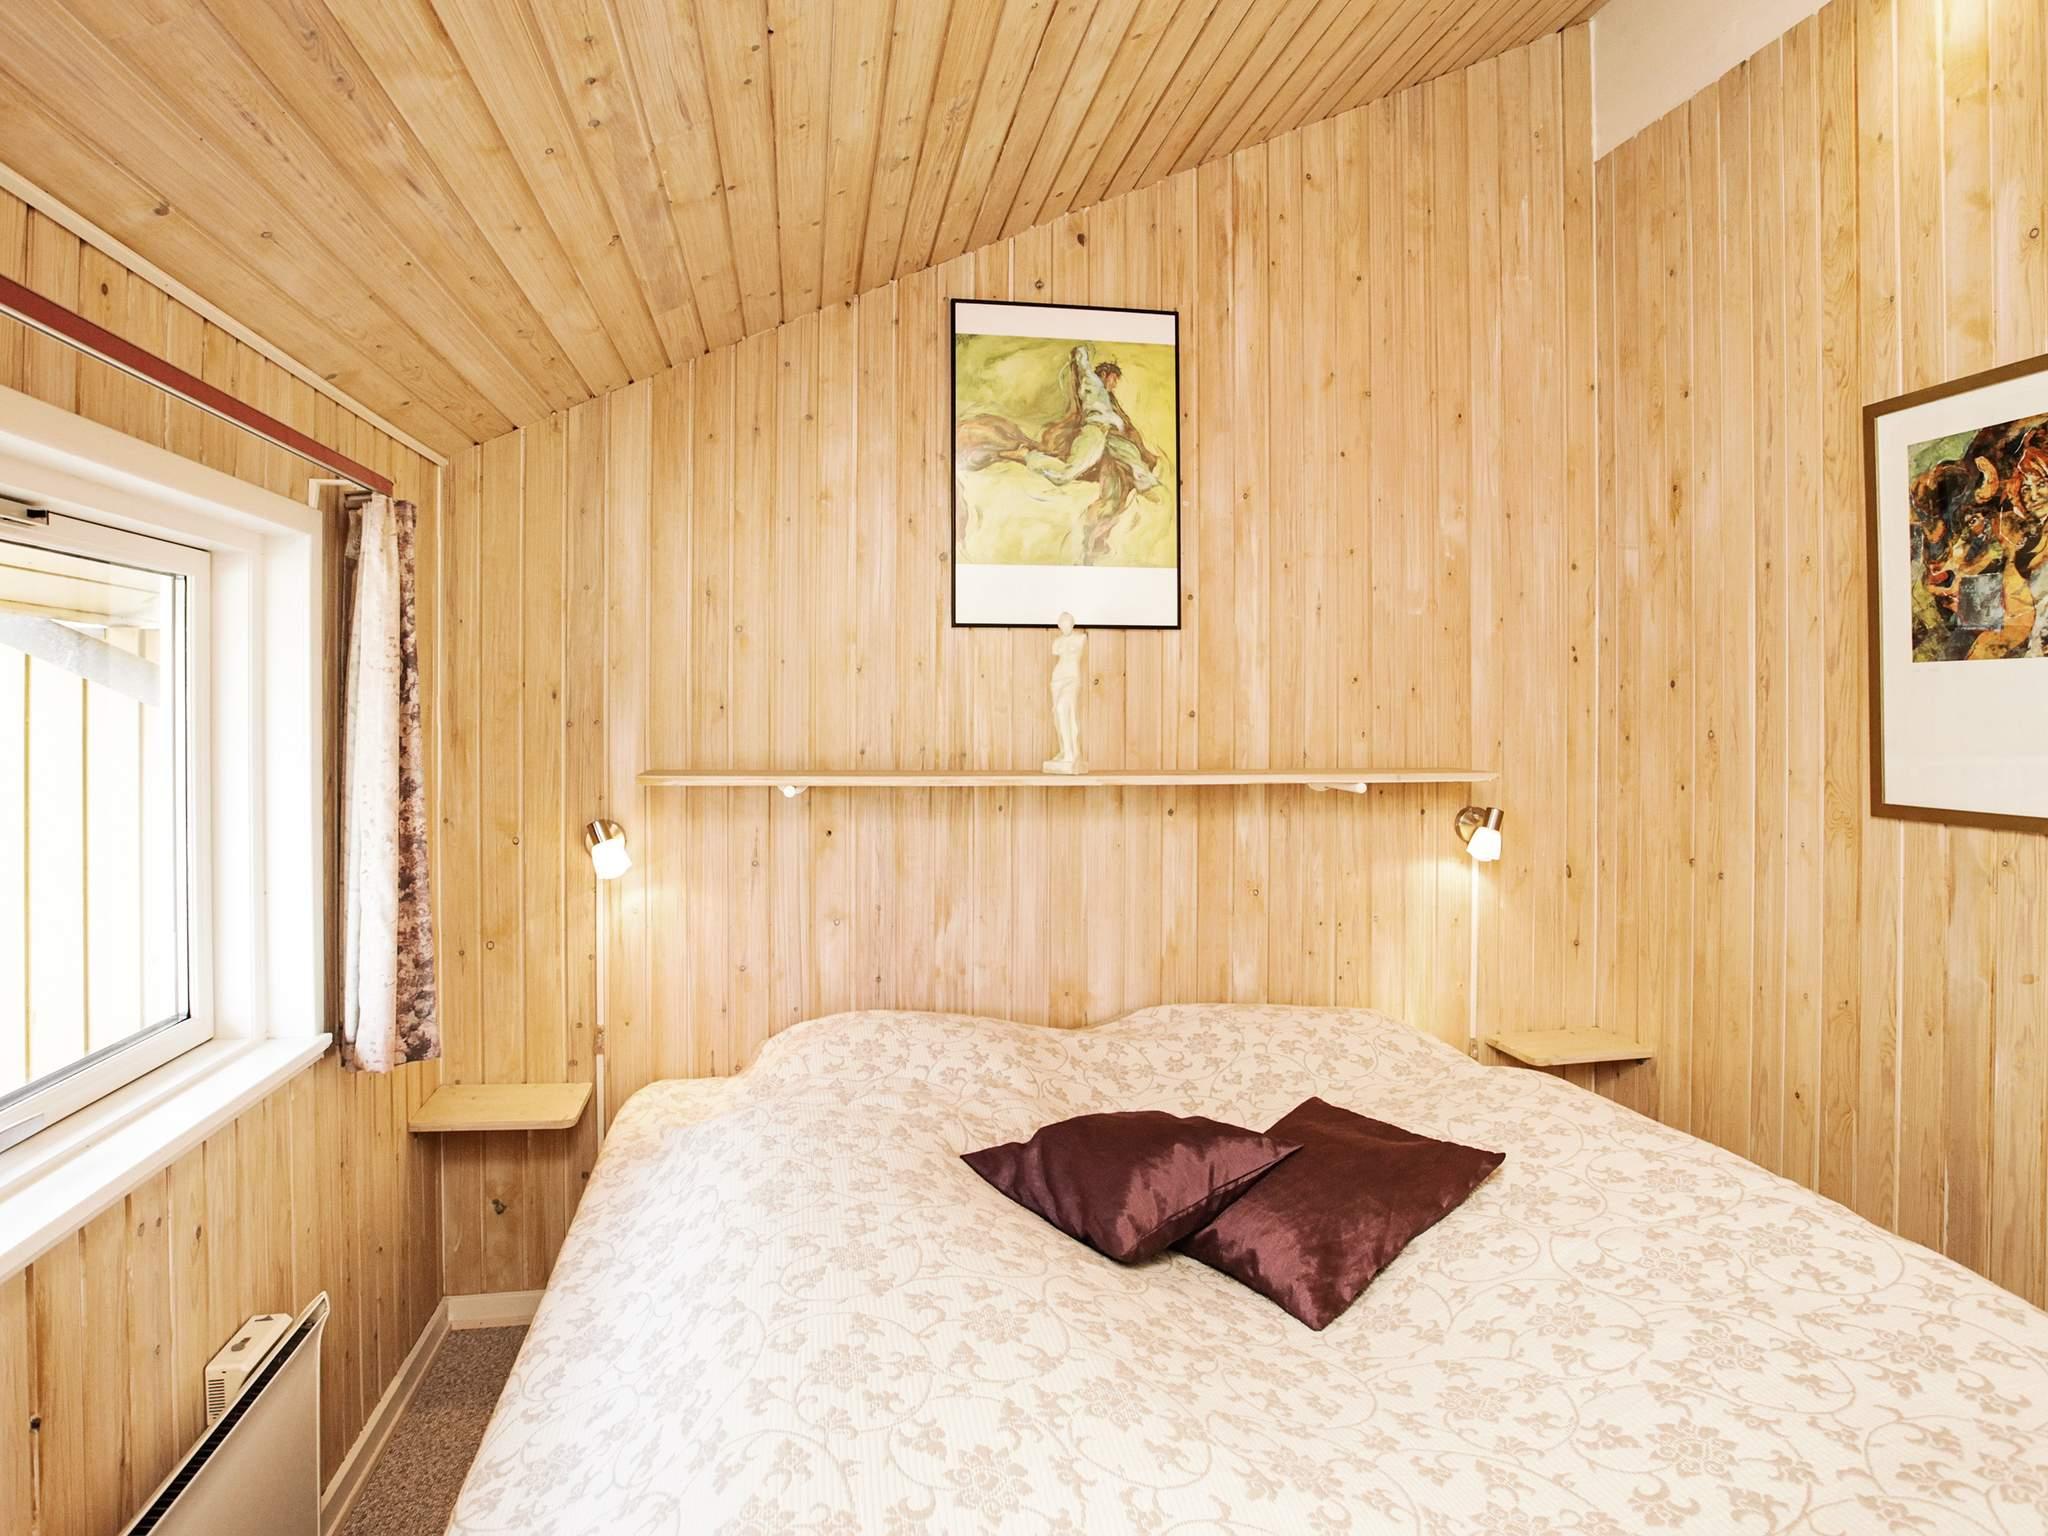 Maison de vacances Falsled (87545), Faldsled, , Fionie, Danemark, image 11